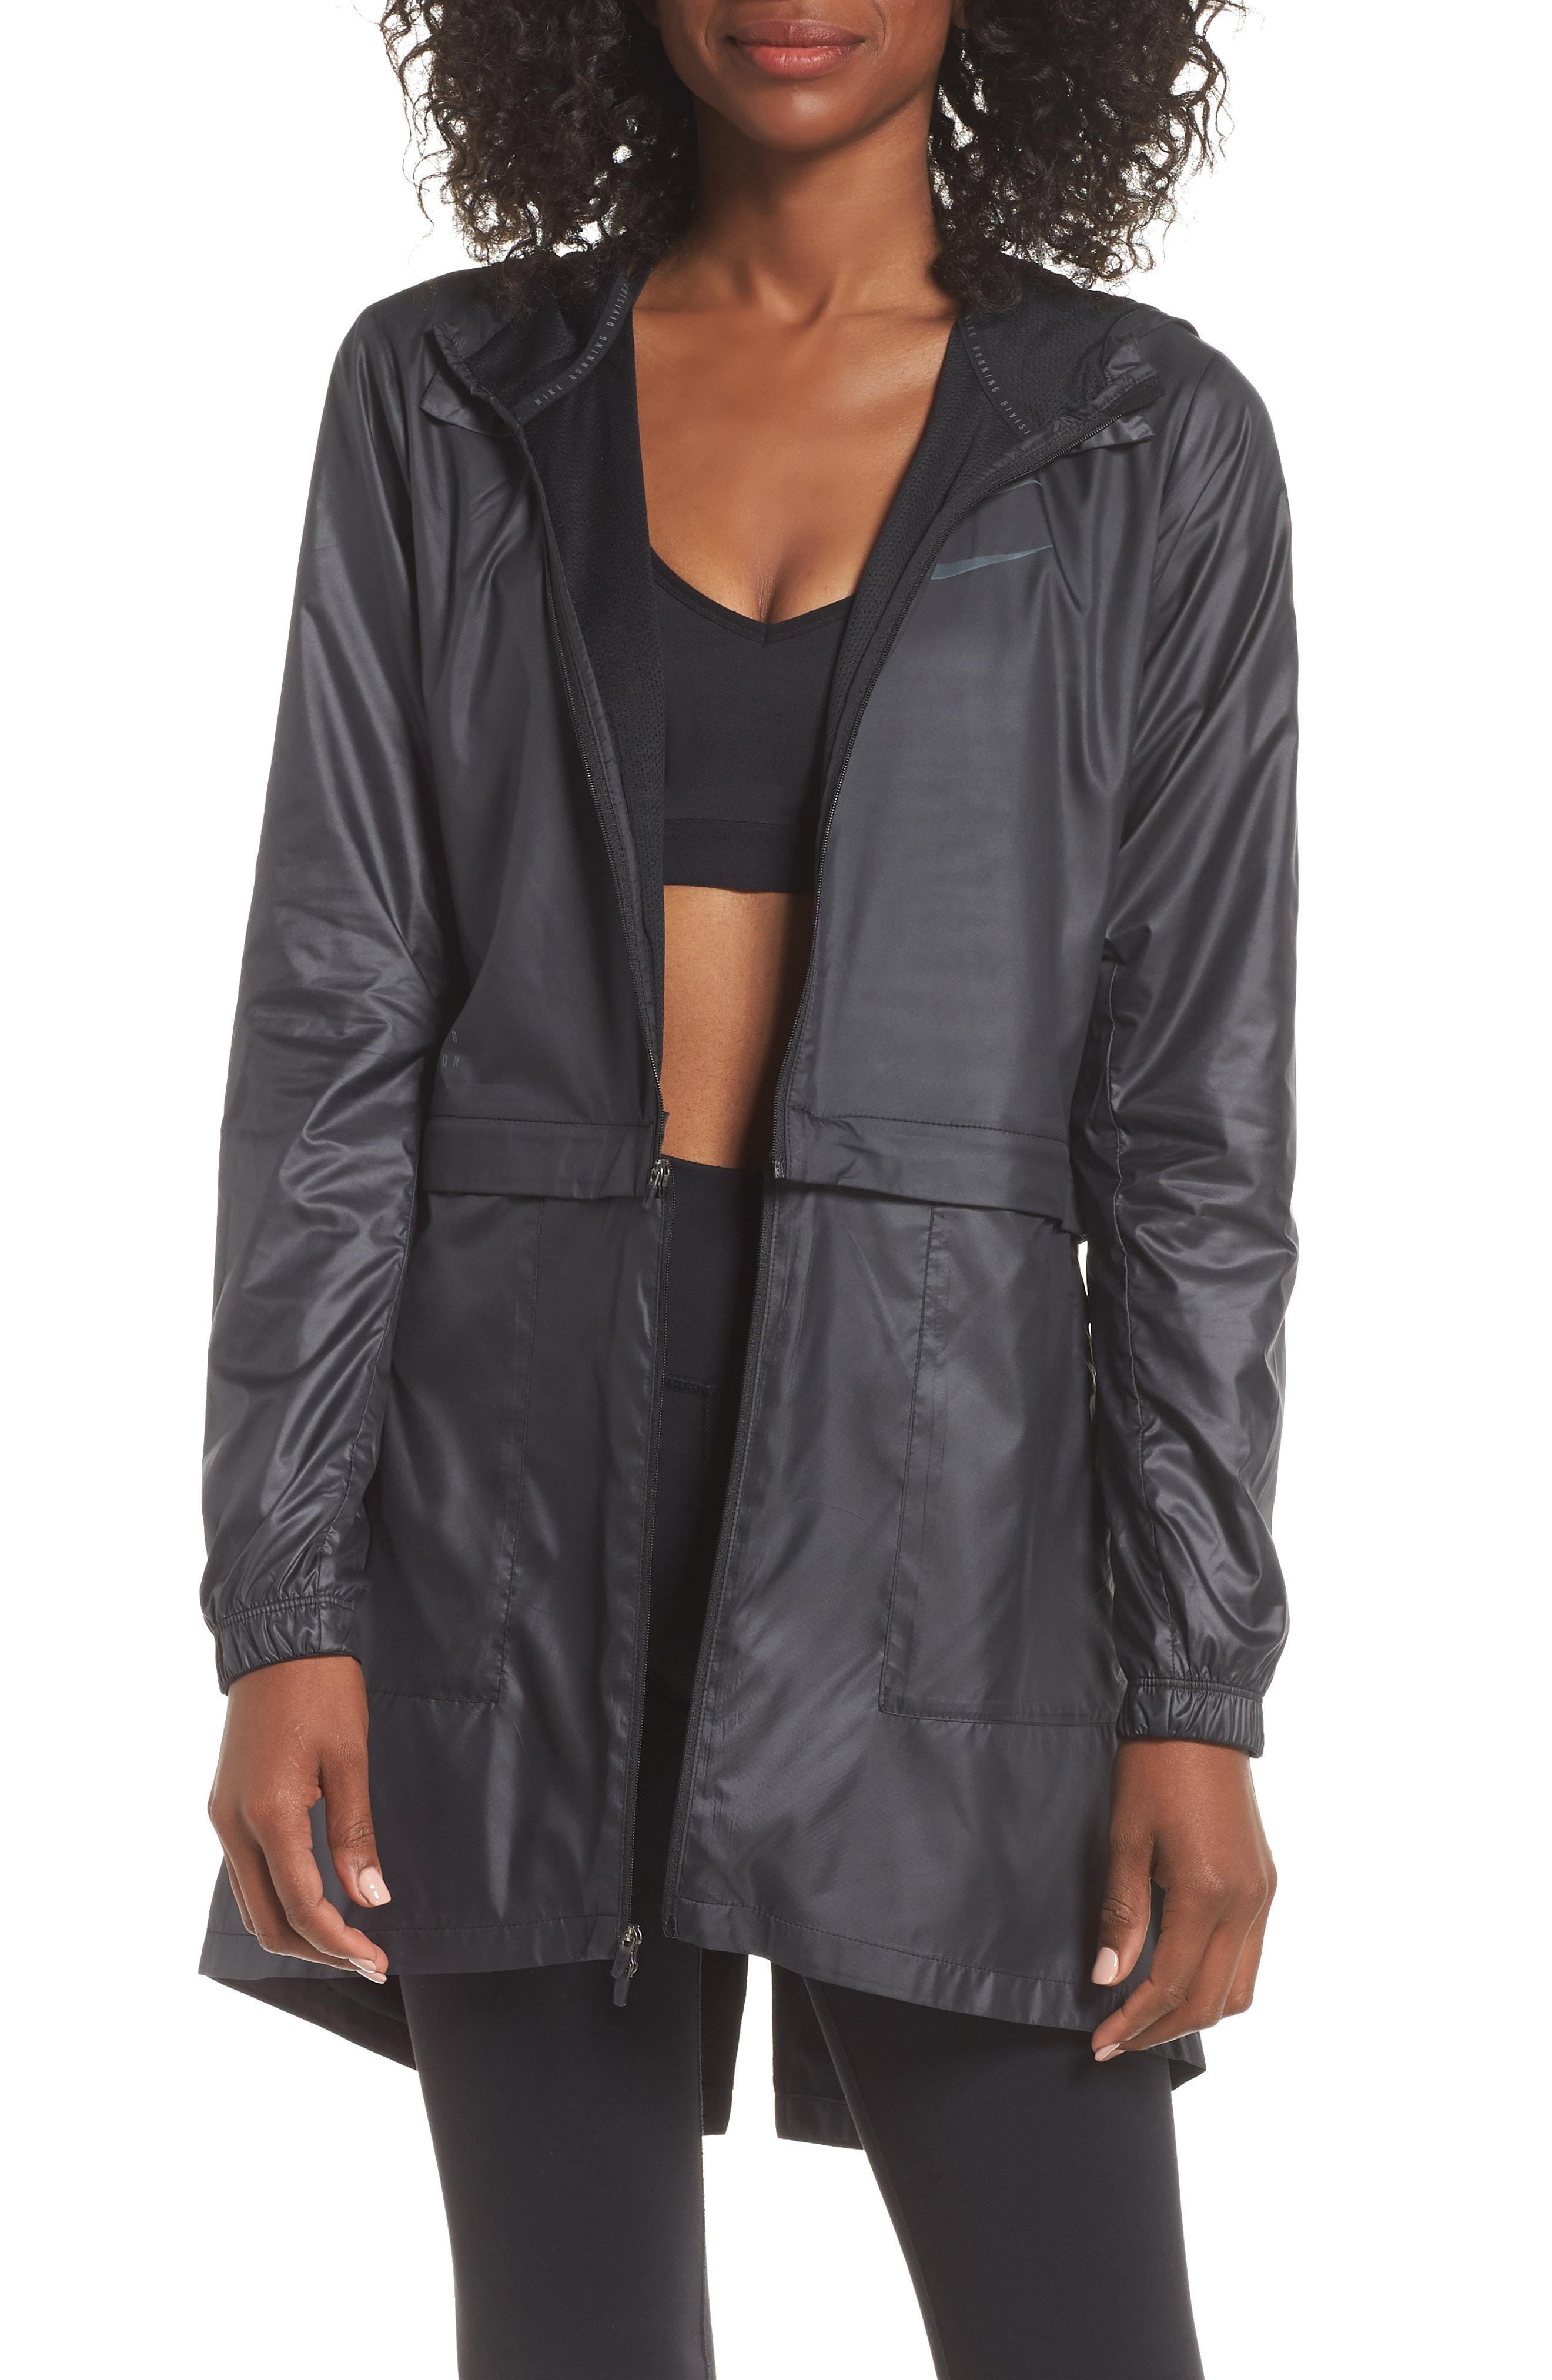 Nike Women's Convertible Hooded Running Jacket